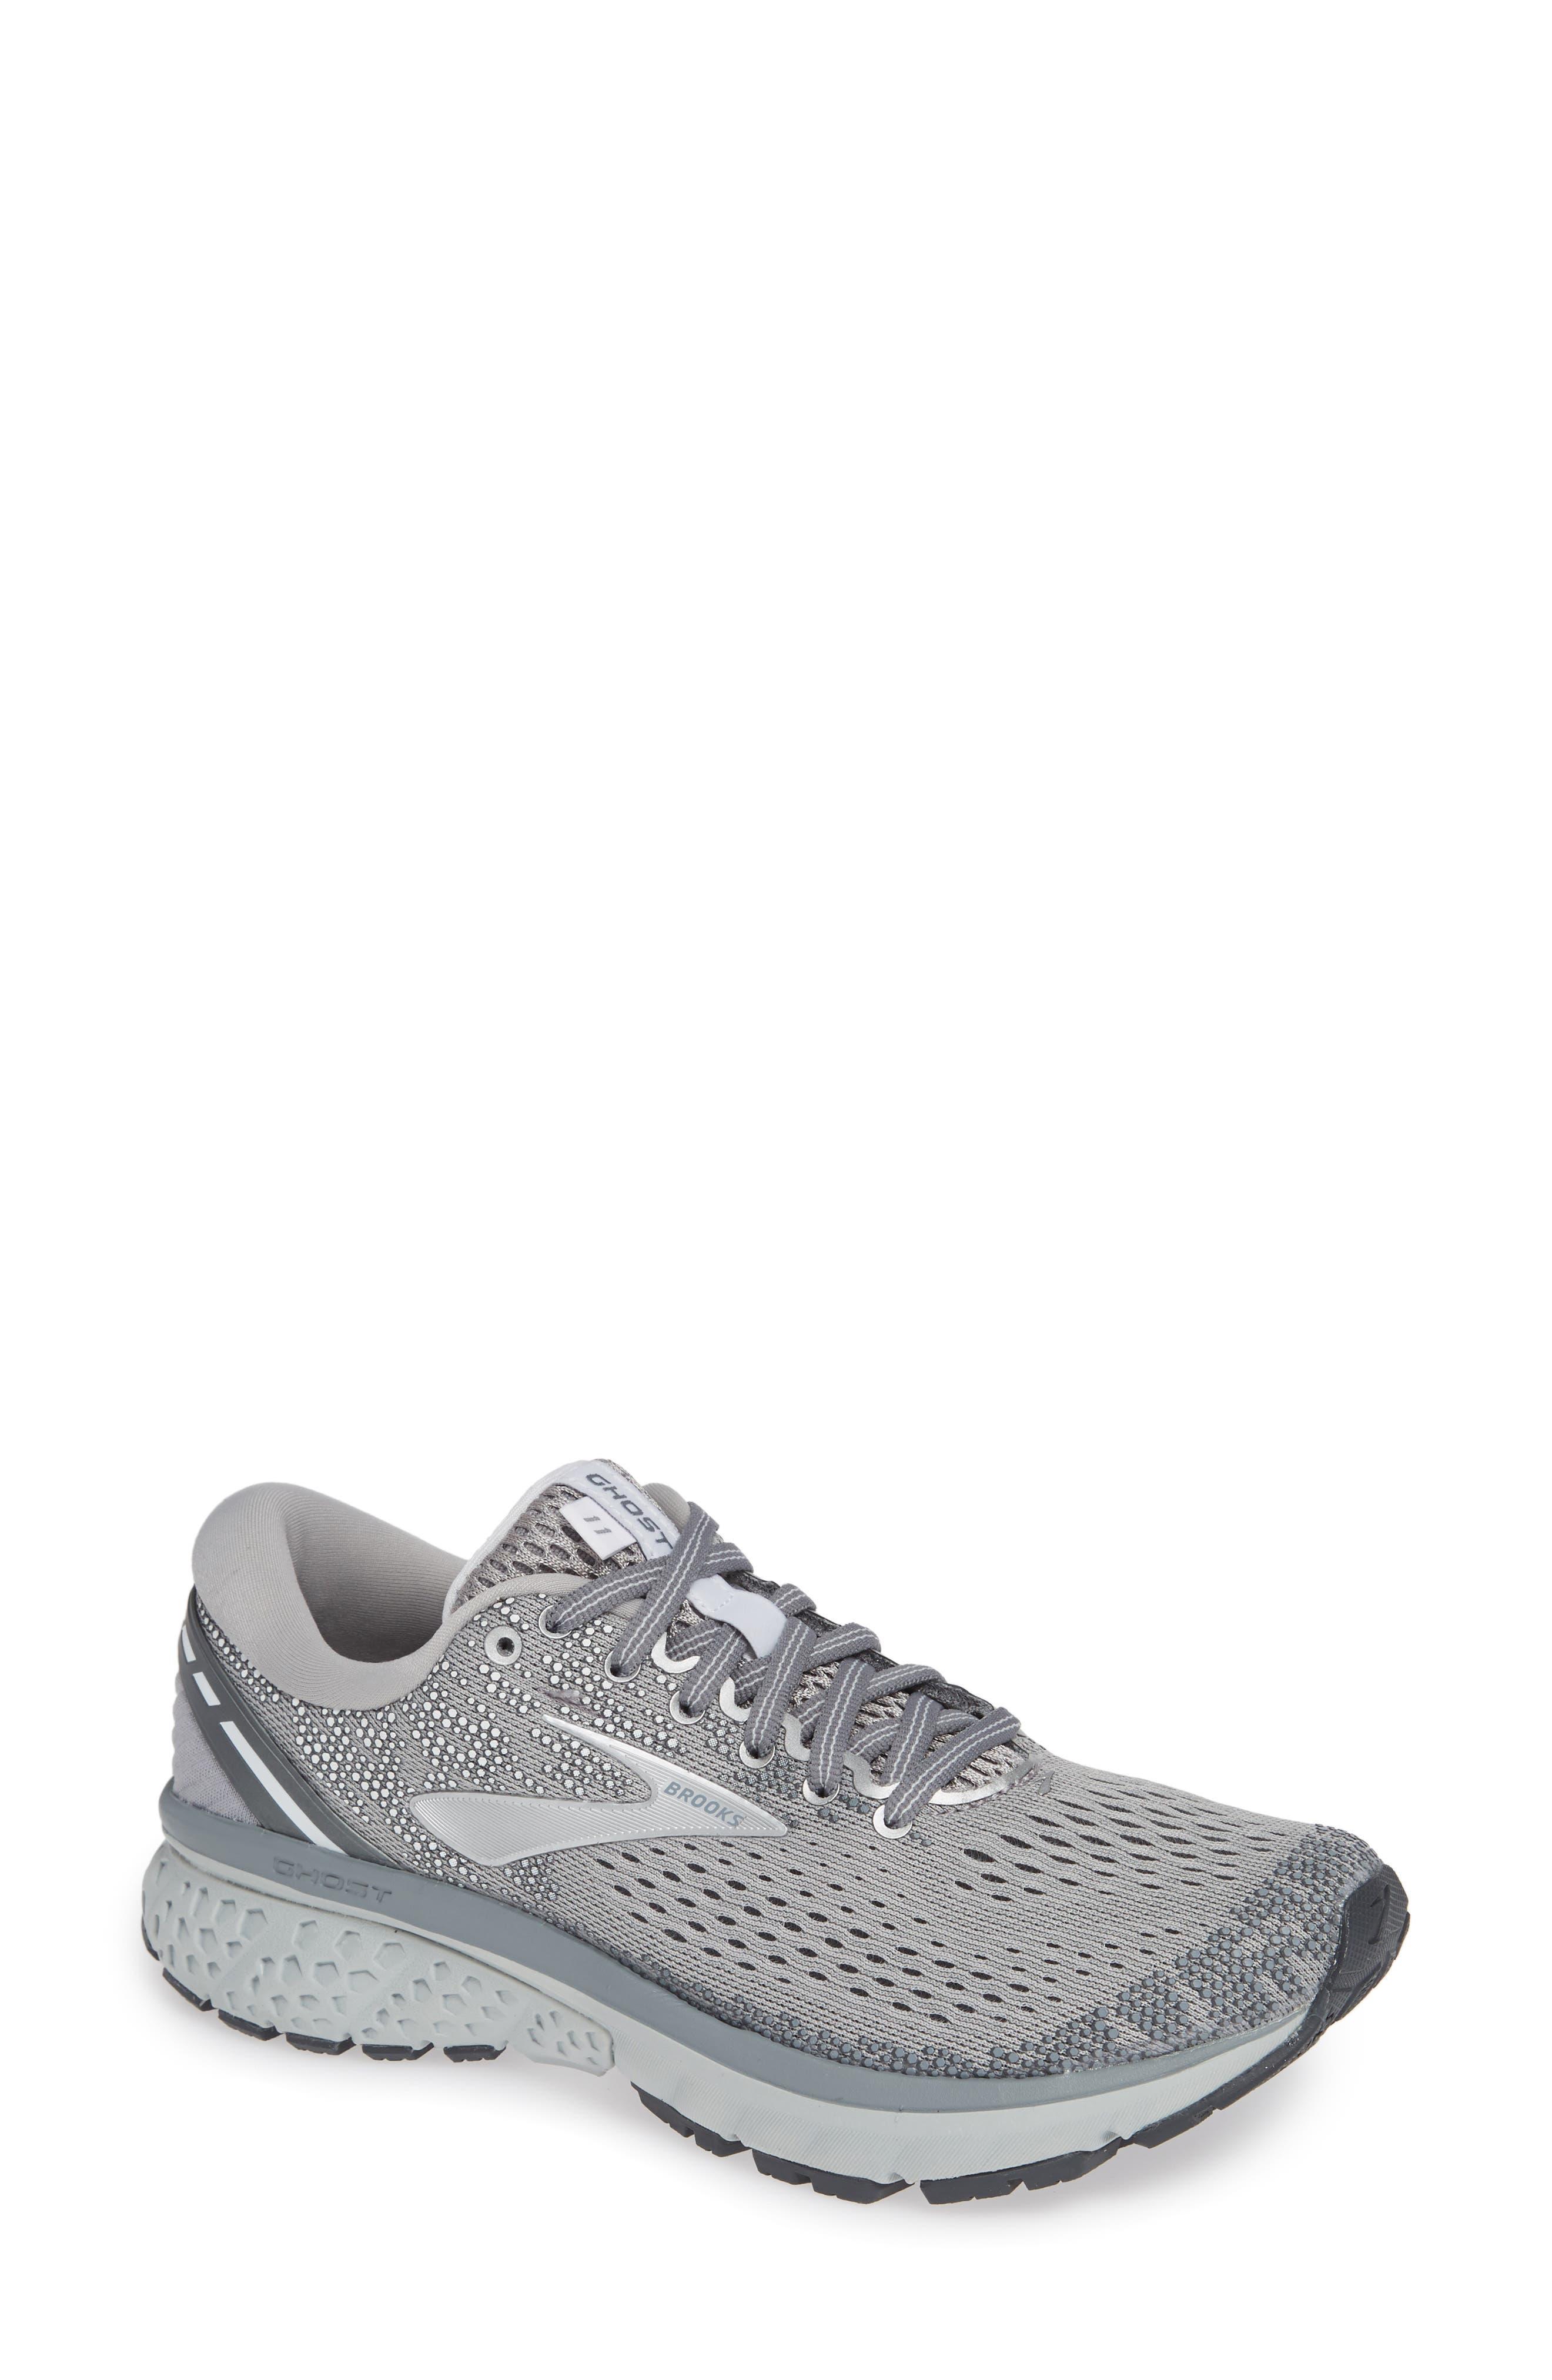 Brooks Ghost 11 Running Shoe, Grey